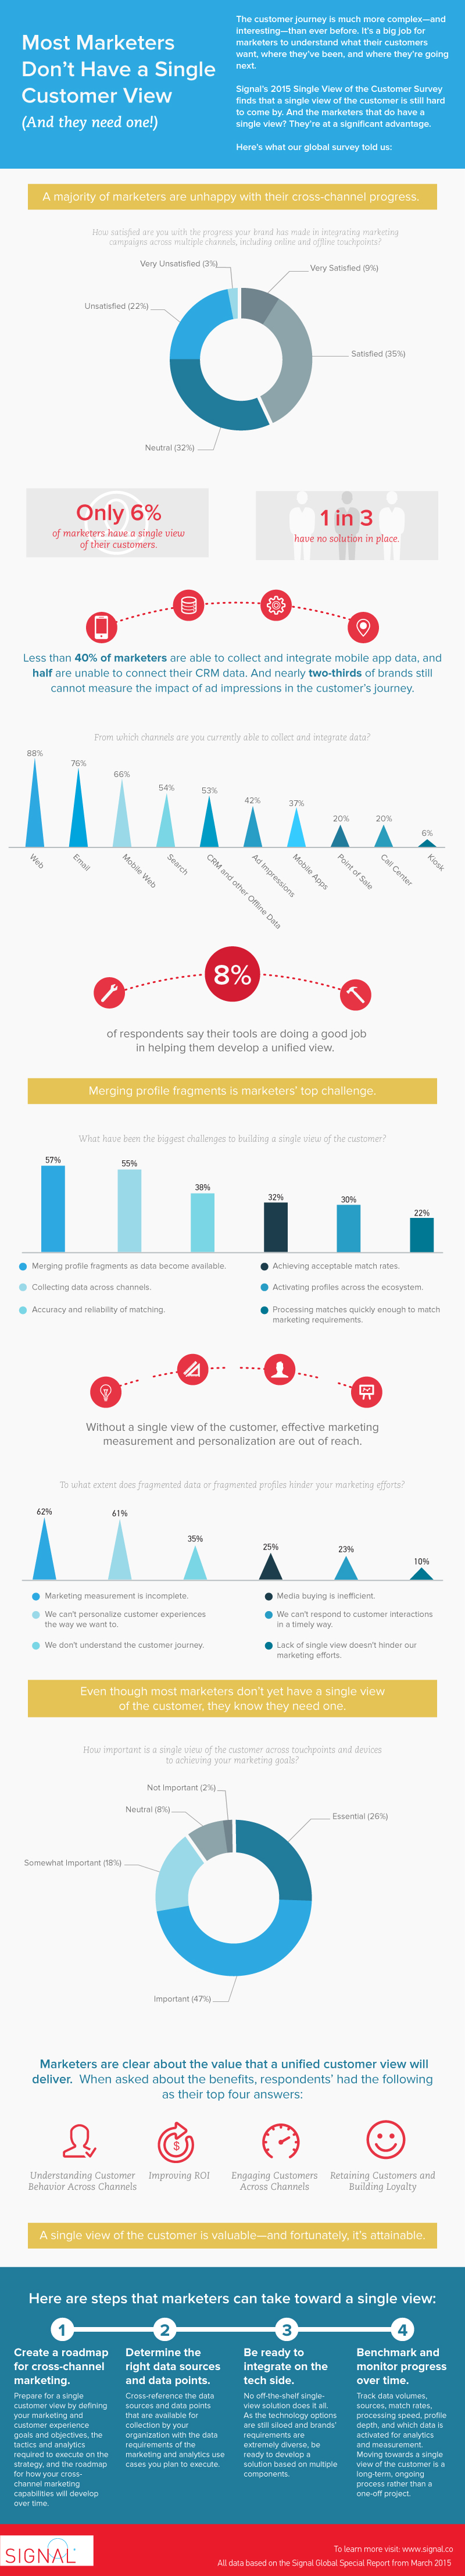 ucv-survey-infographic1